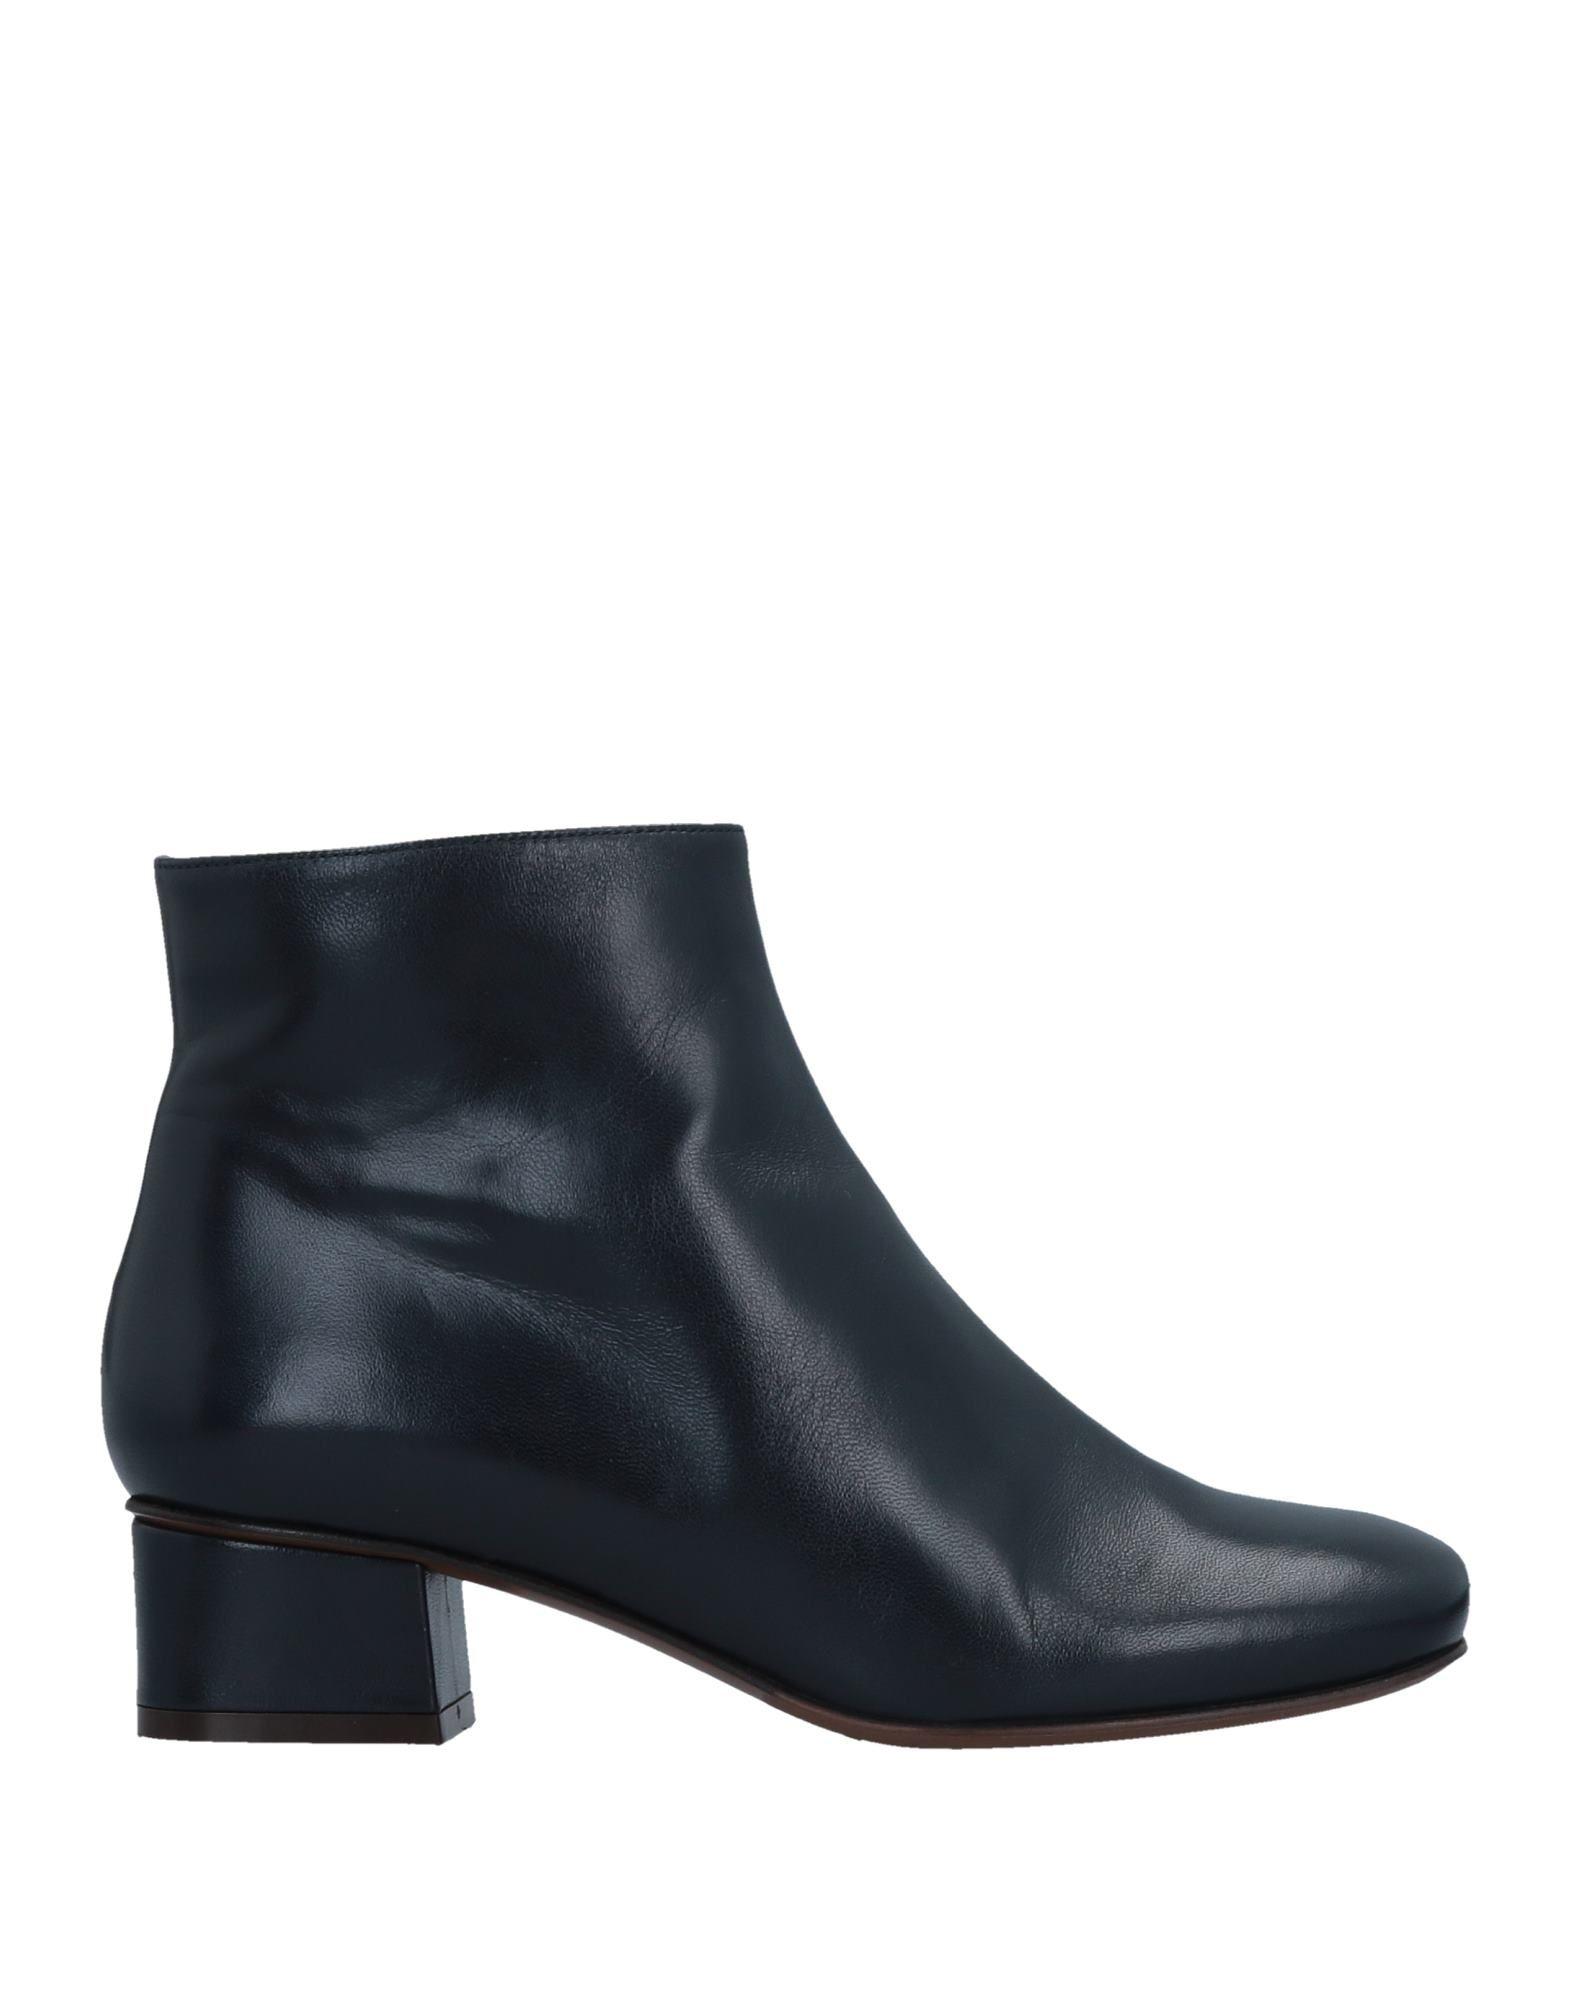 Rabatt Schuhe L' Autre Chose Stiefelette Damen  45414775EH